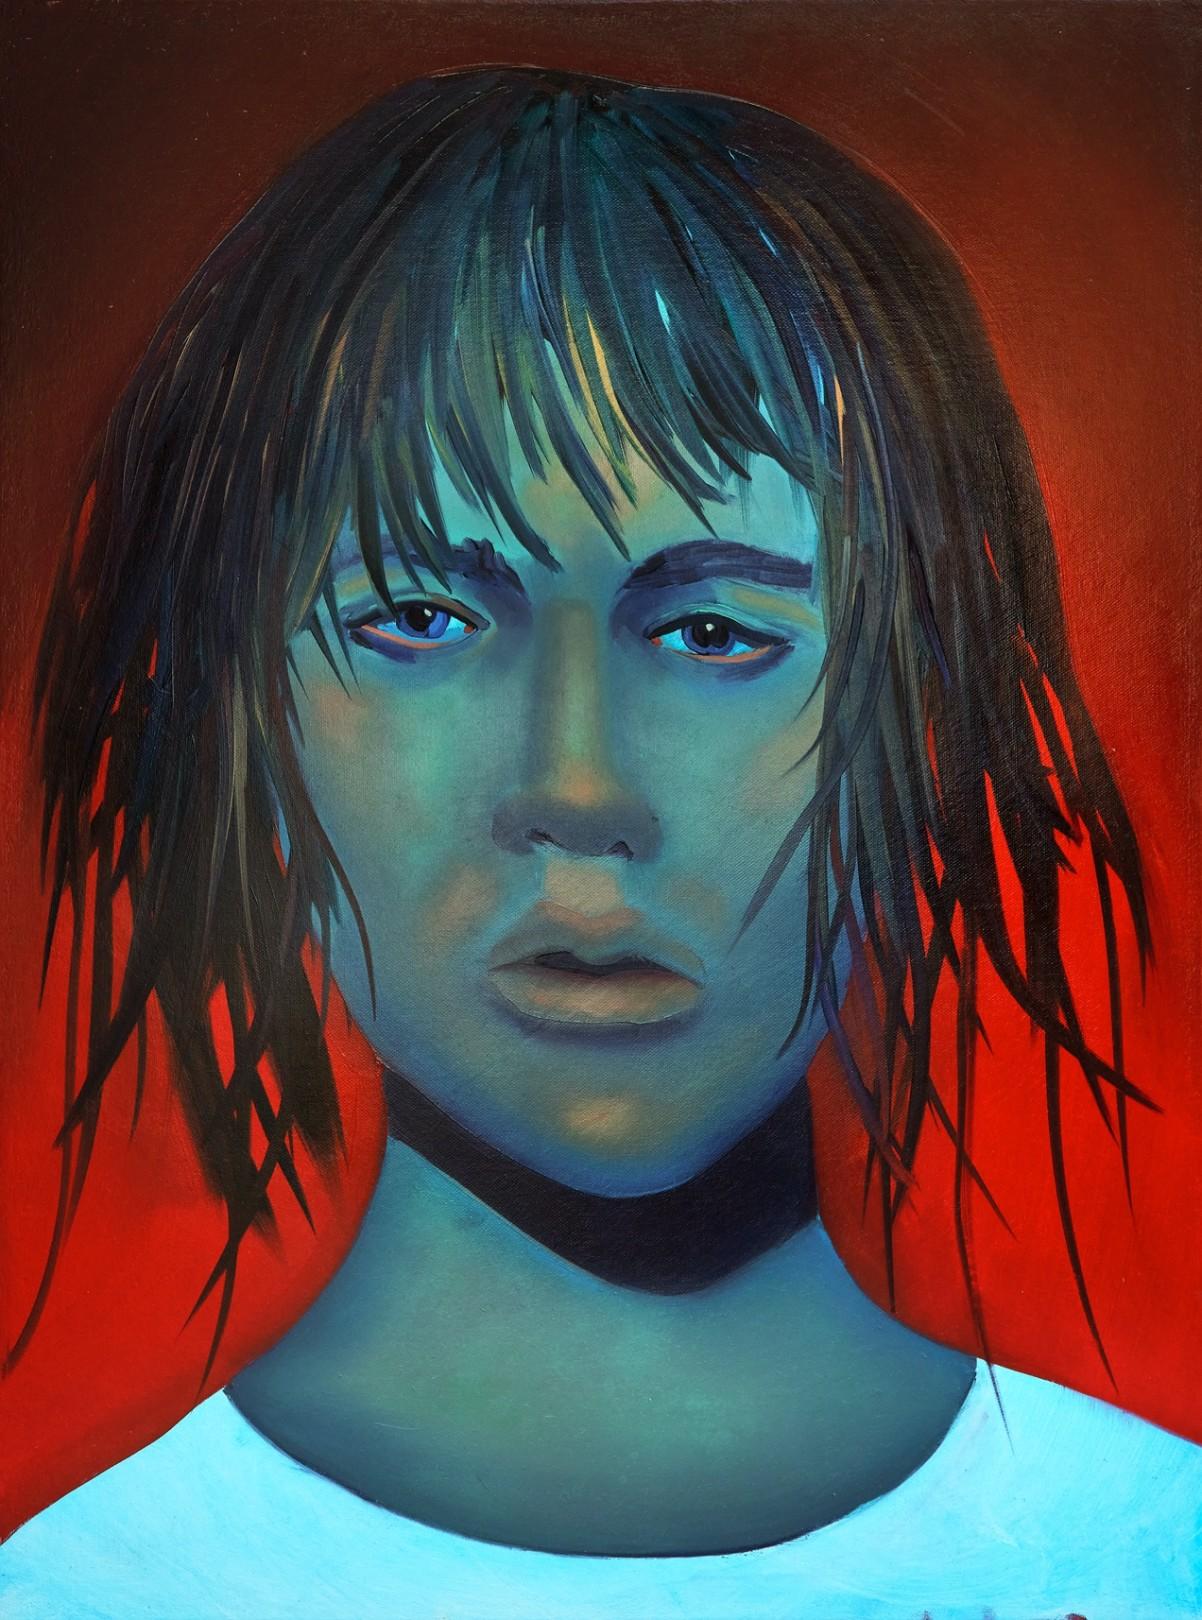 Daredevil, 2021 Oil on canvas 61 x 45.5 cm. / 24 x 18 in.